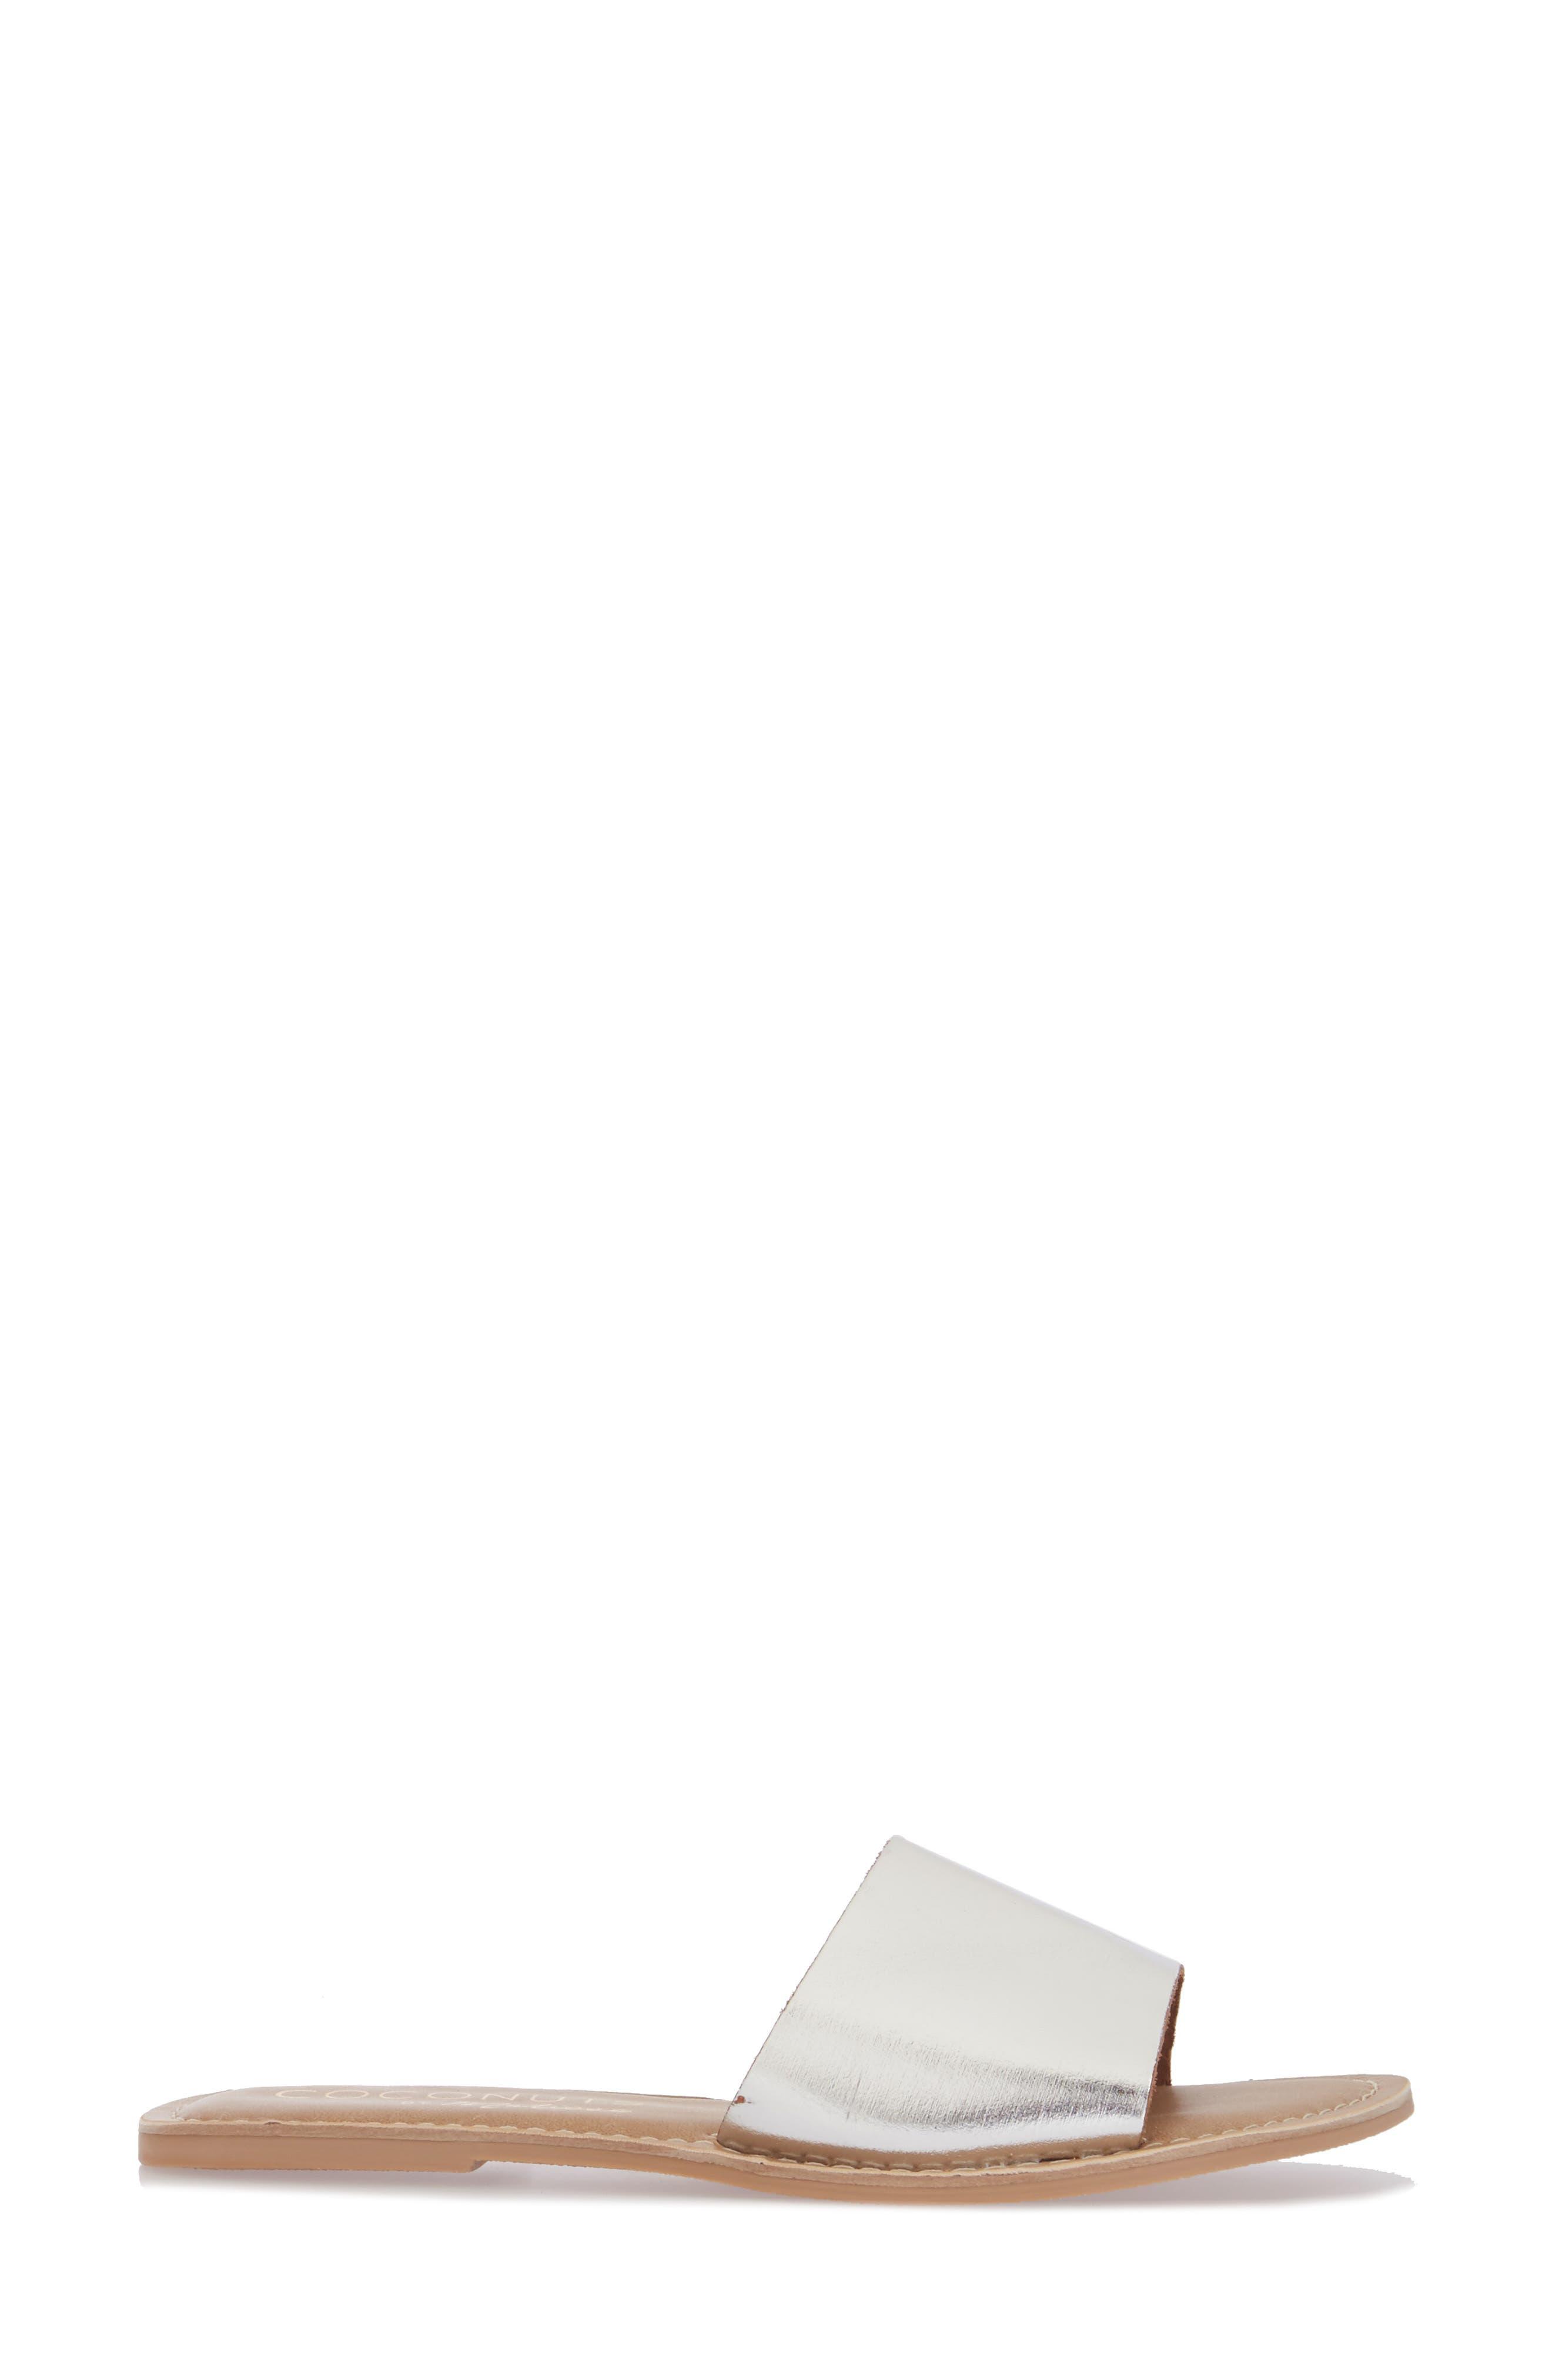 Cabana Slide Sandal,                             Alternate thumbnail 3, color,                             Silver Leather